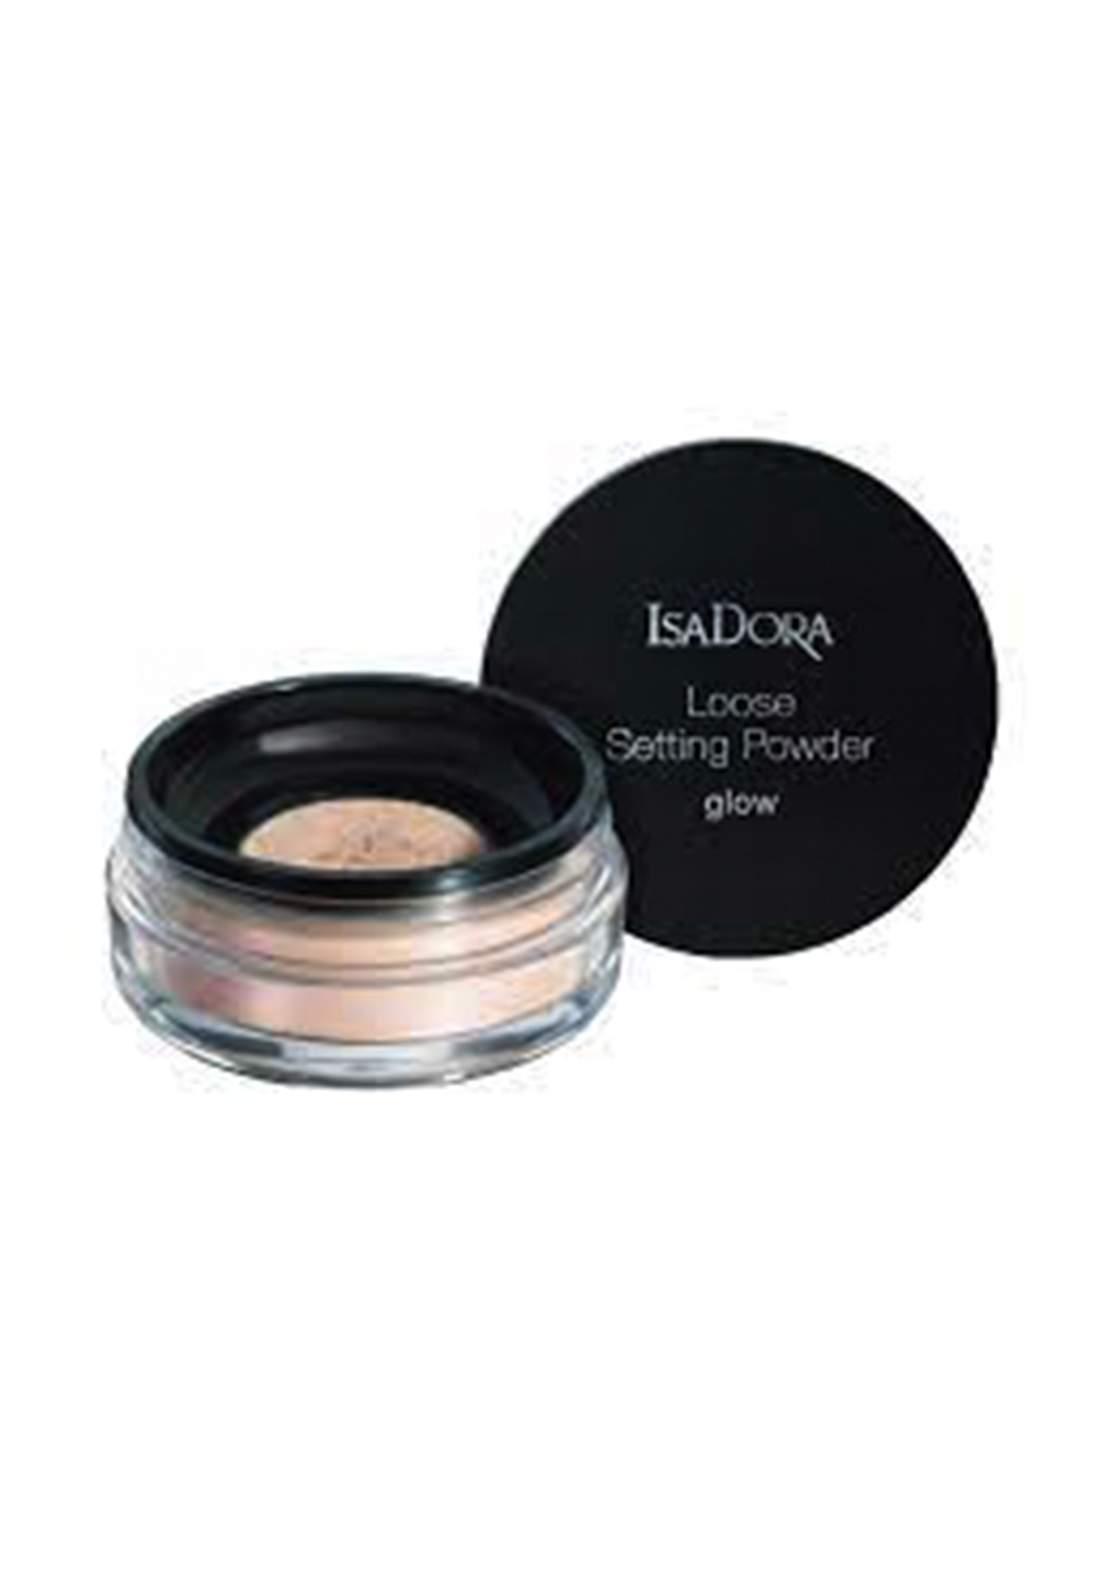 IsaDora 316548 Loose Setting Powder Glow NO.20 بودرة تثبيت سائبة